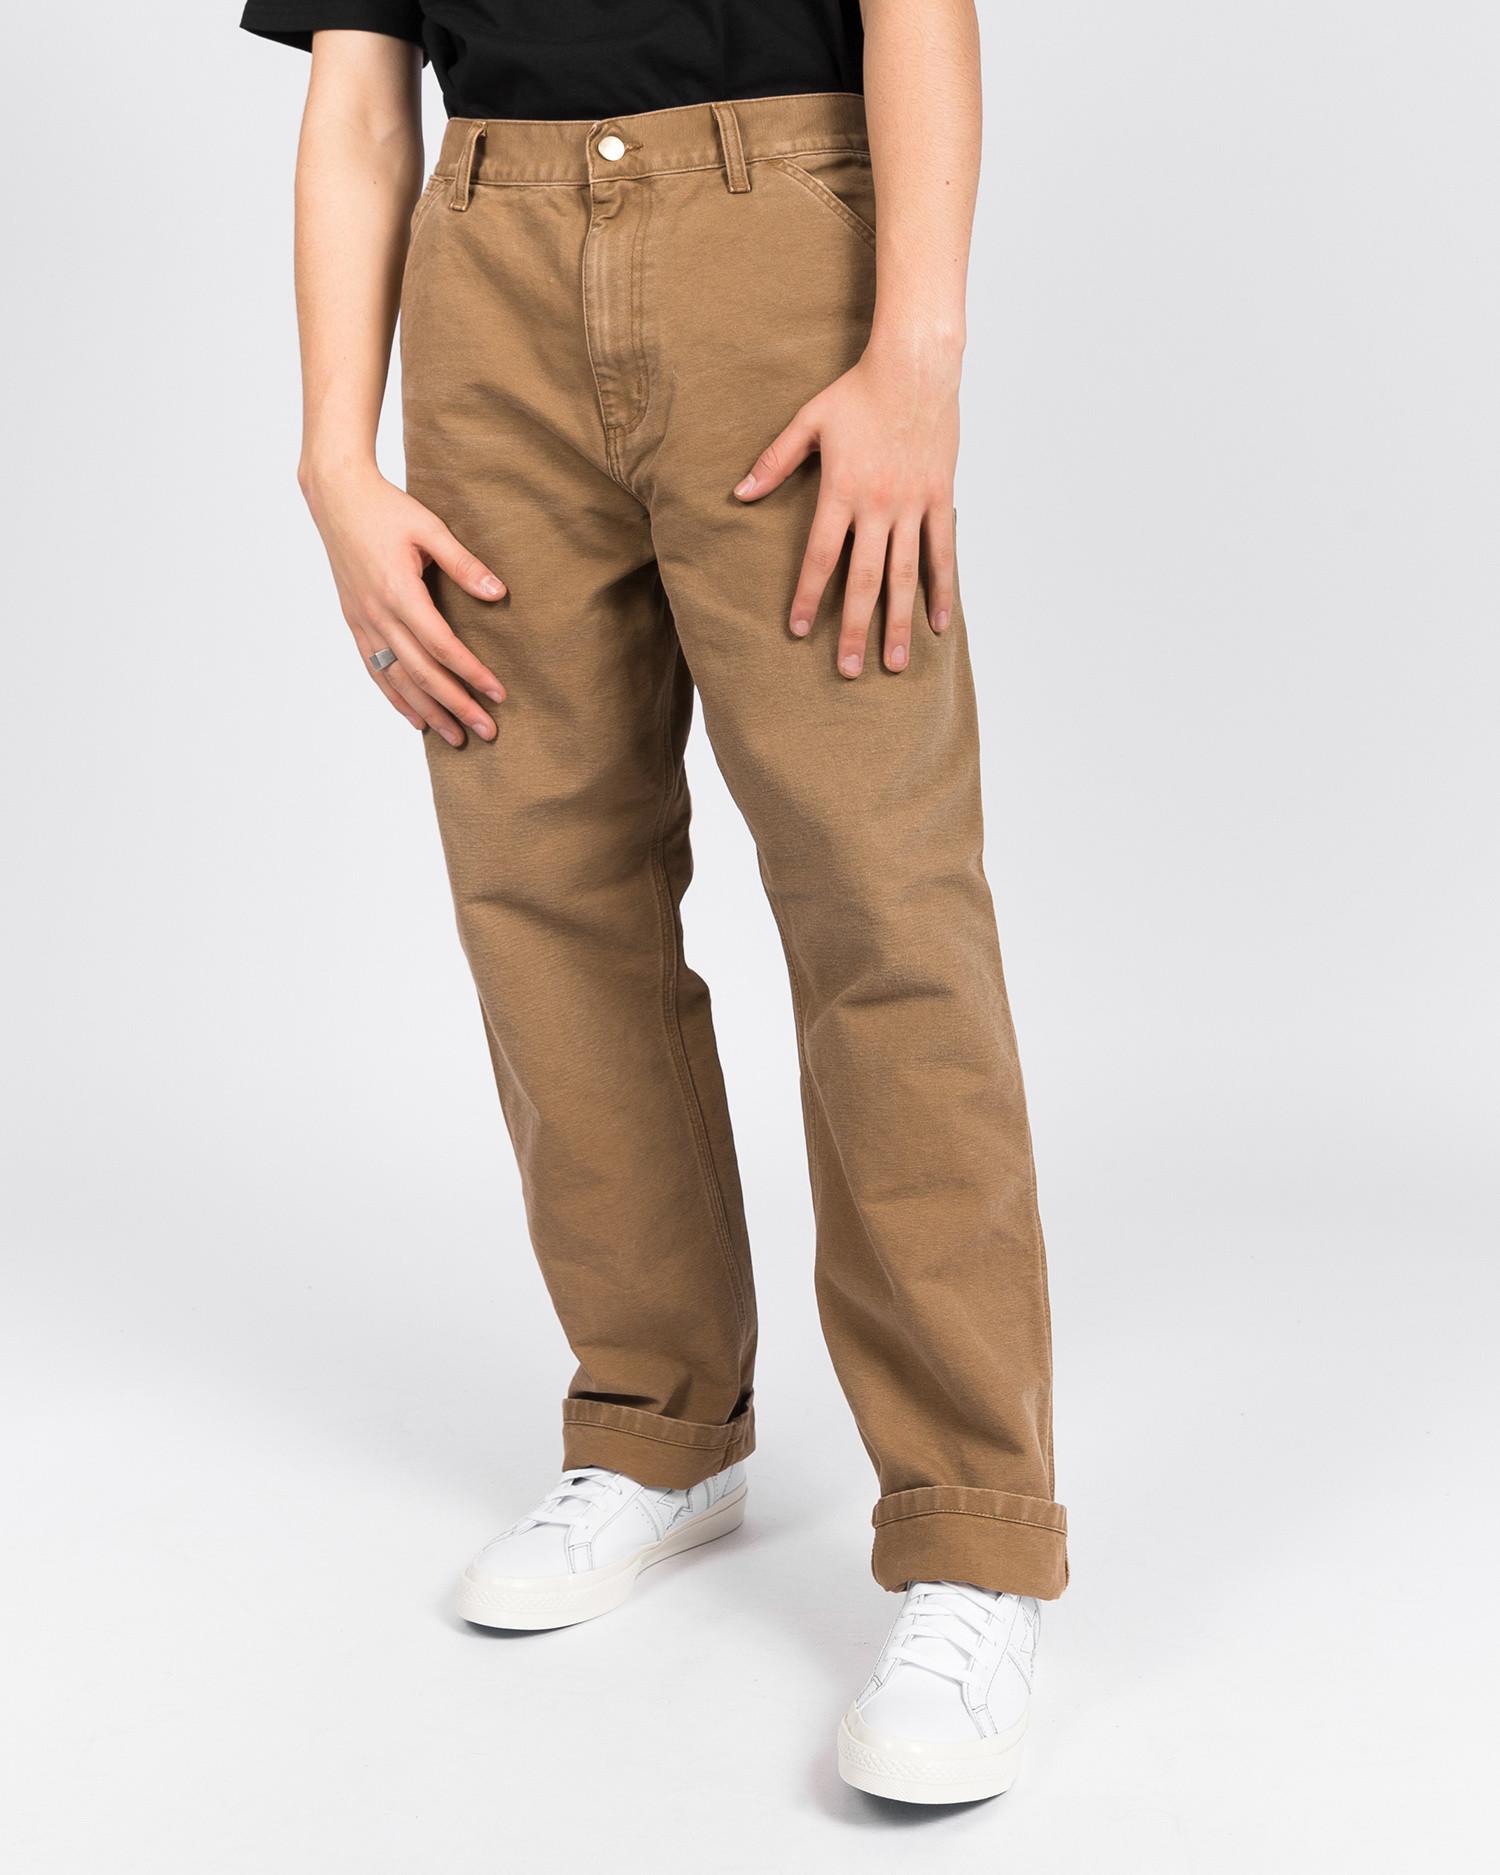 Carhartt Single Knee Pant 100% Organic Cotton Hamilton Brown, aged canvas